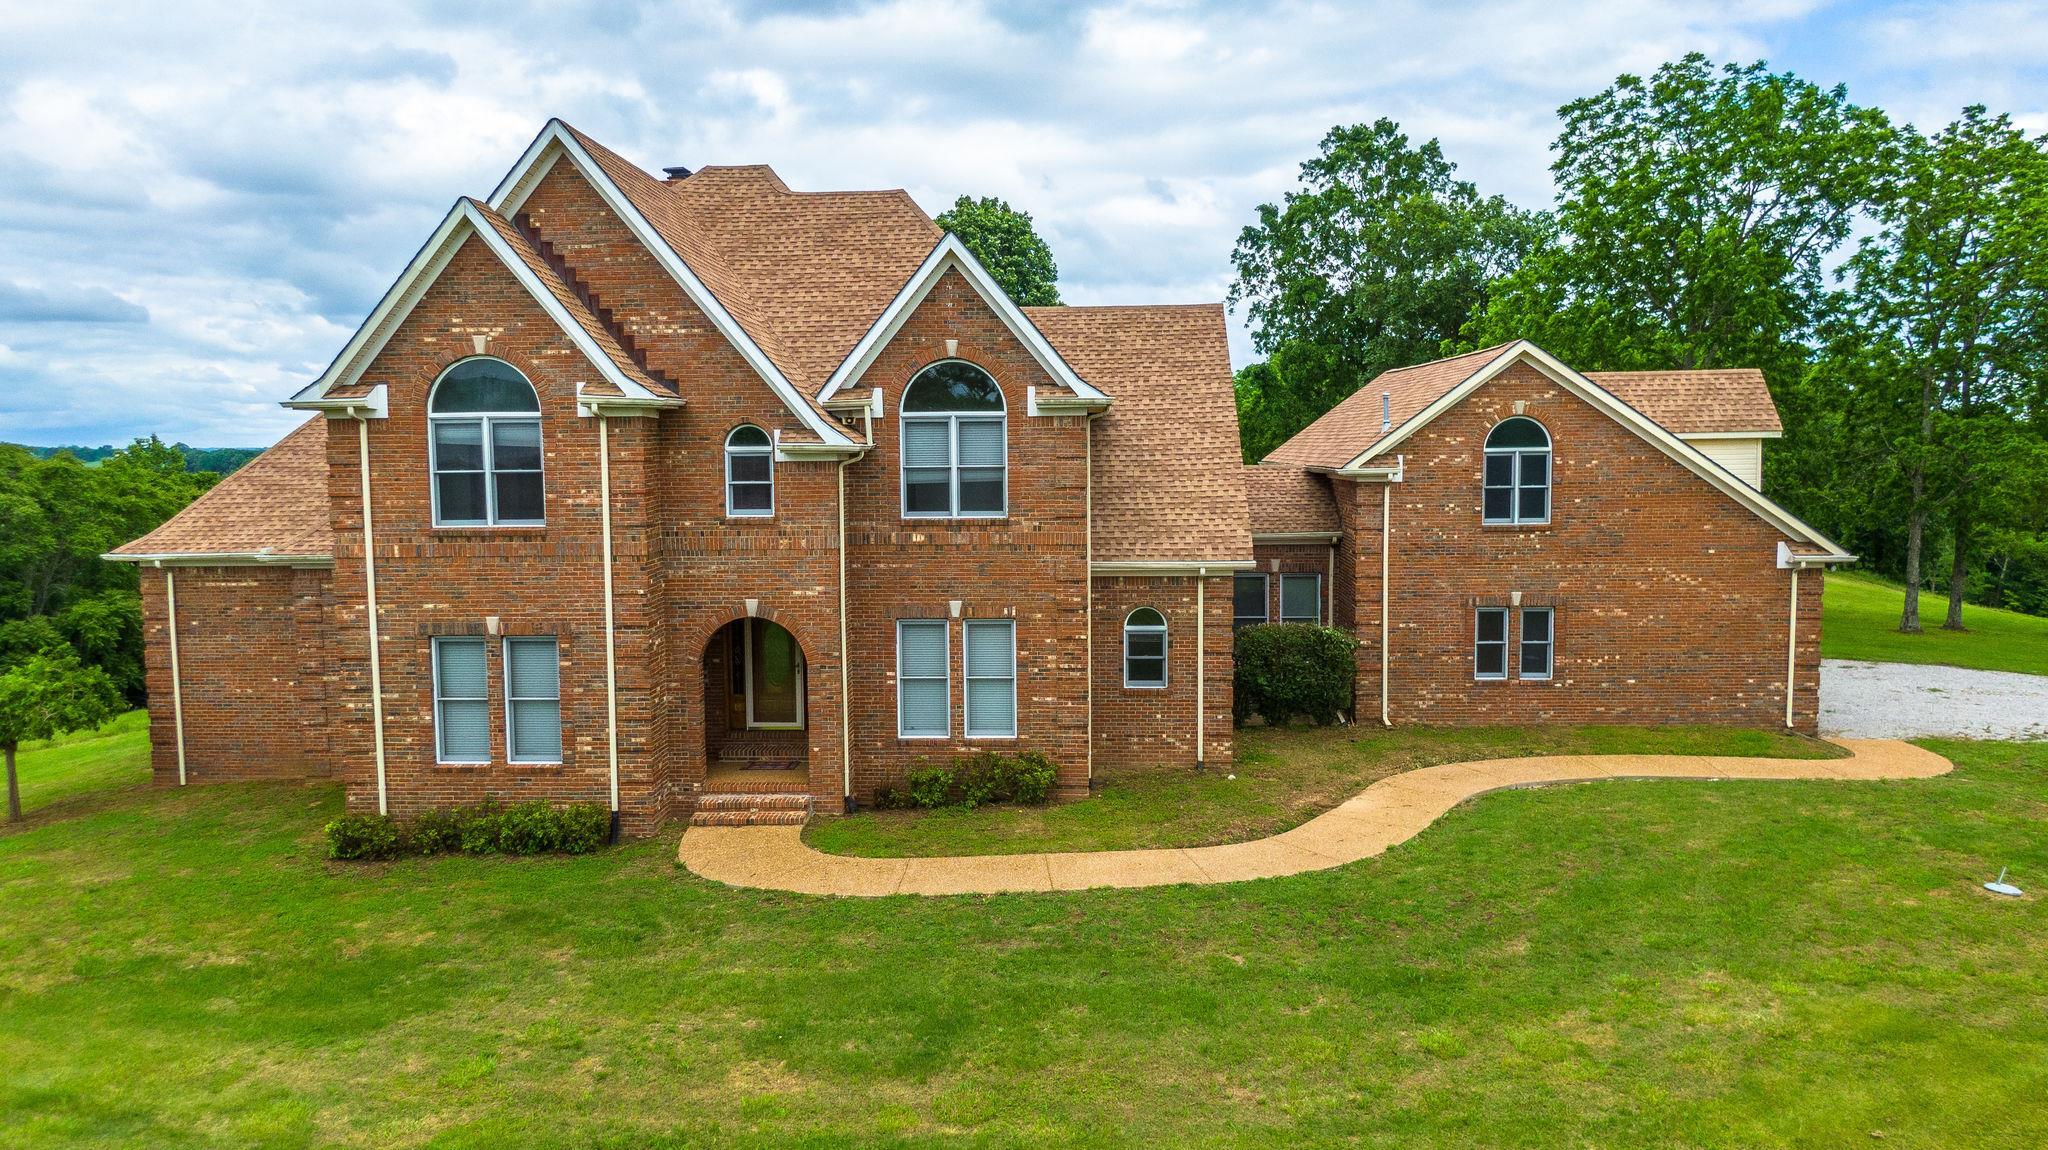 5668 Campbellsville Rd, Pulaski, TN 38478 - Pulaski, TN real estate listing